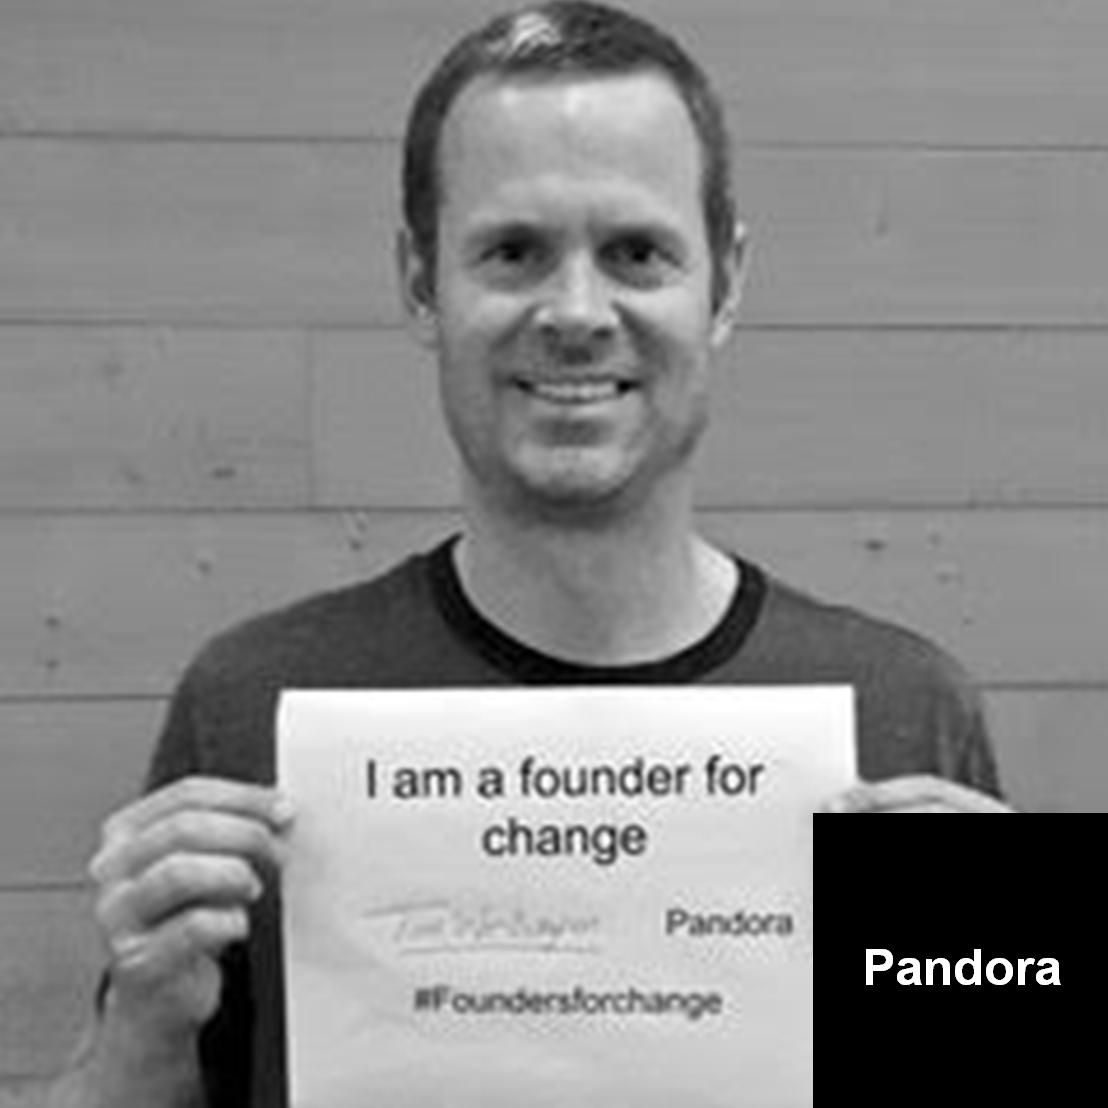 Tim Westergren_Pandora.png